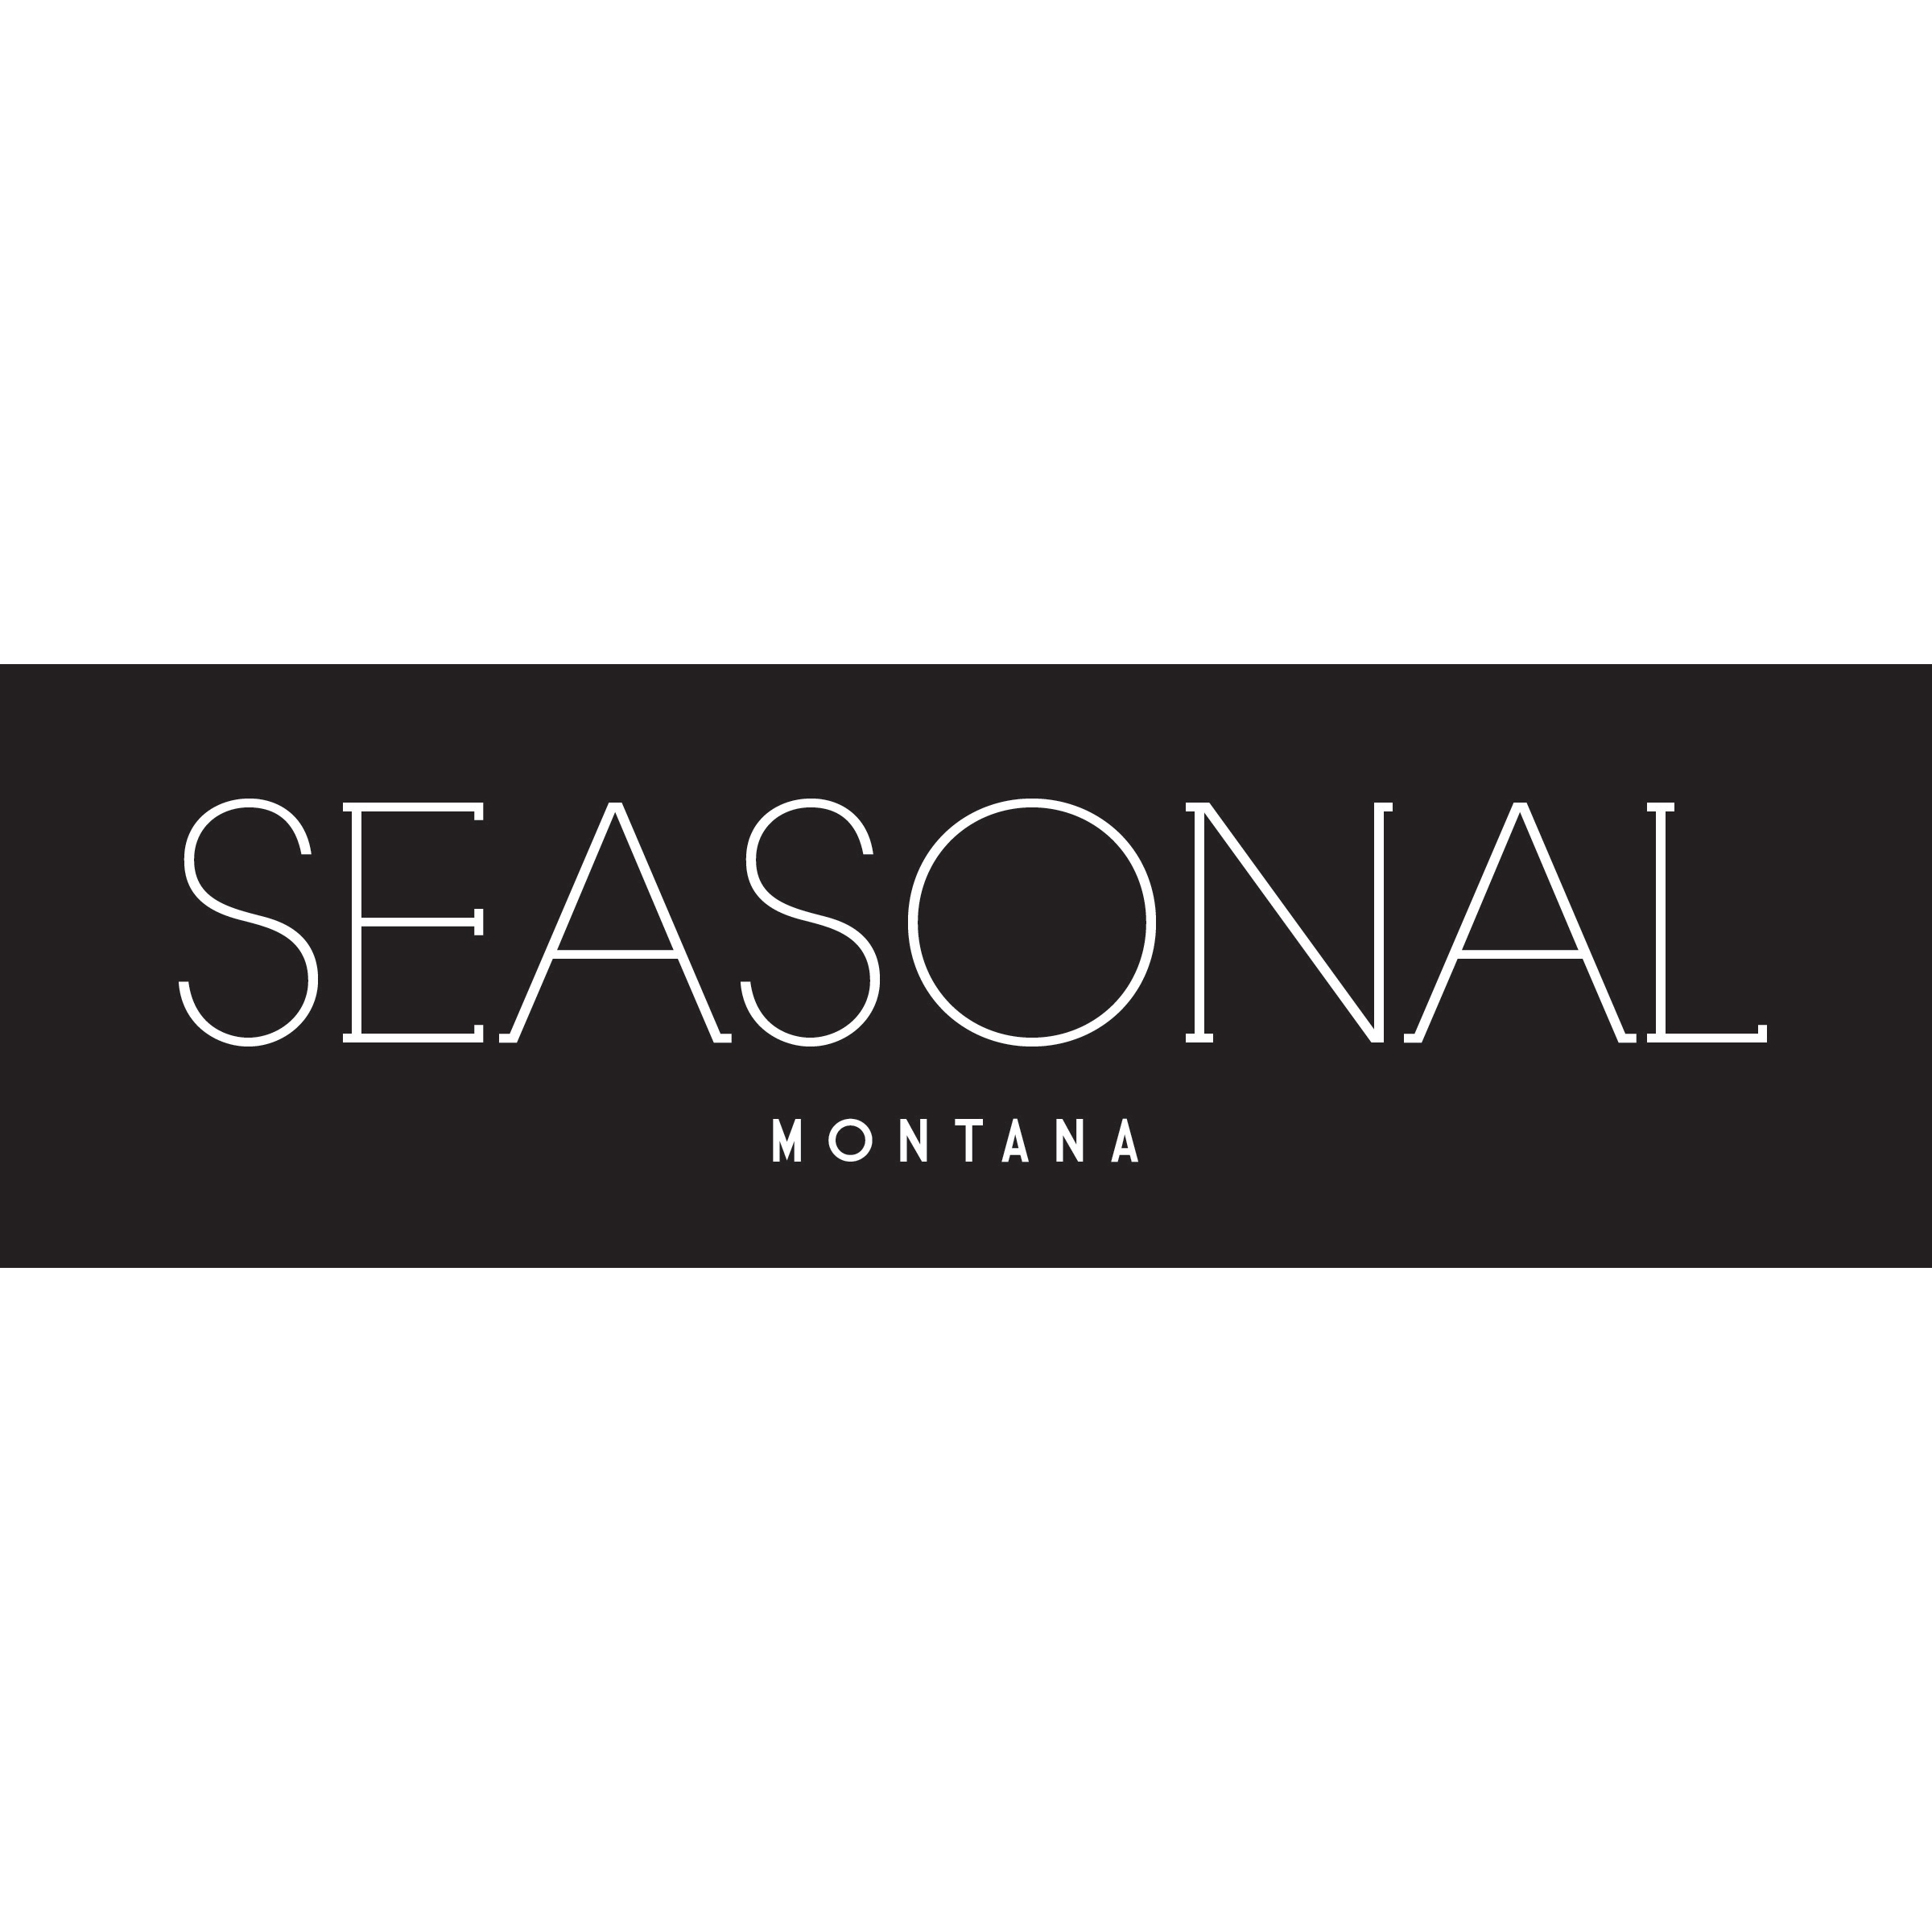 Seasonal Montana